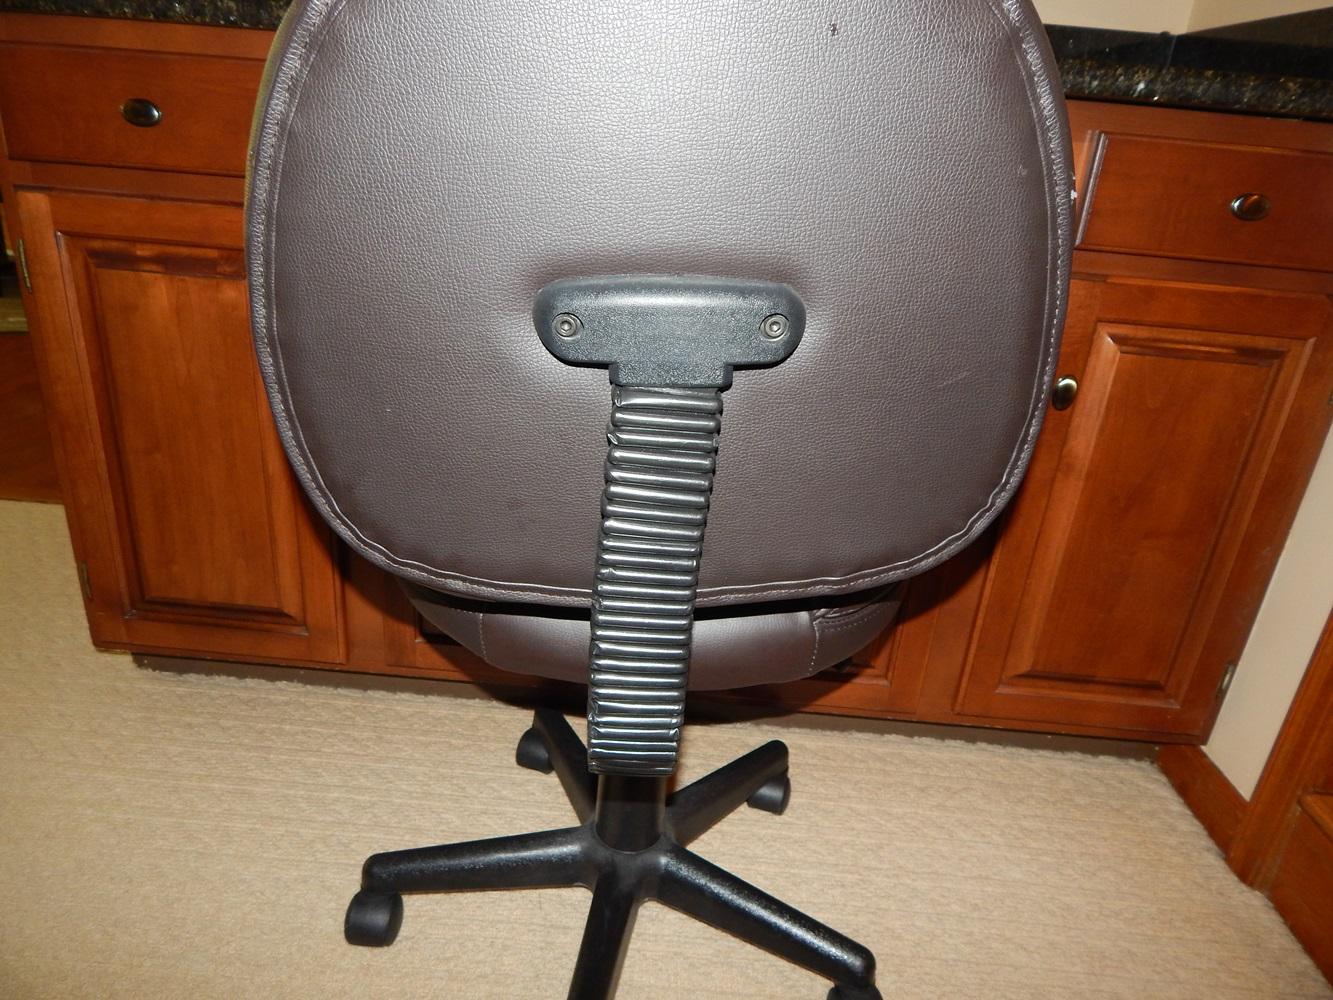 staples turcotte chair brown design book pdf office ebth